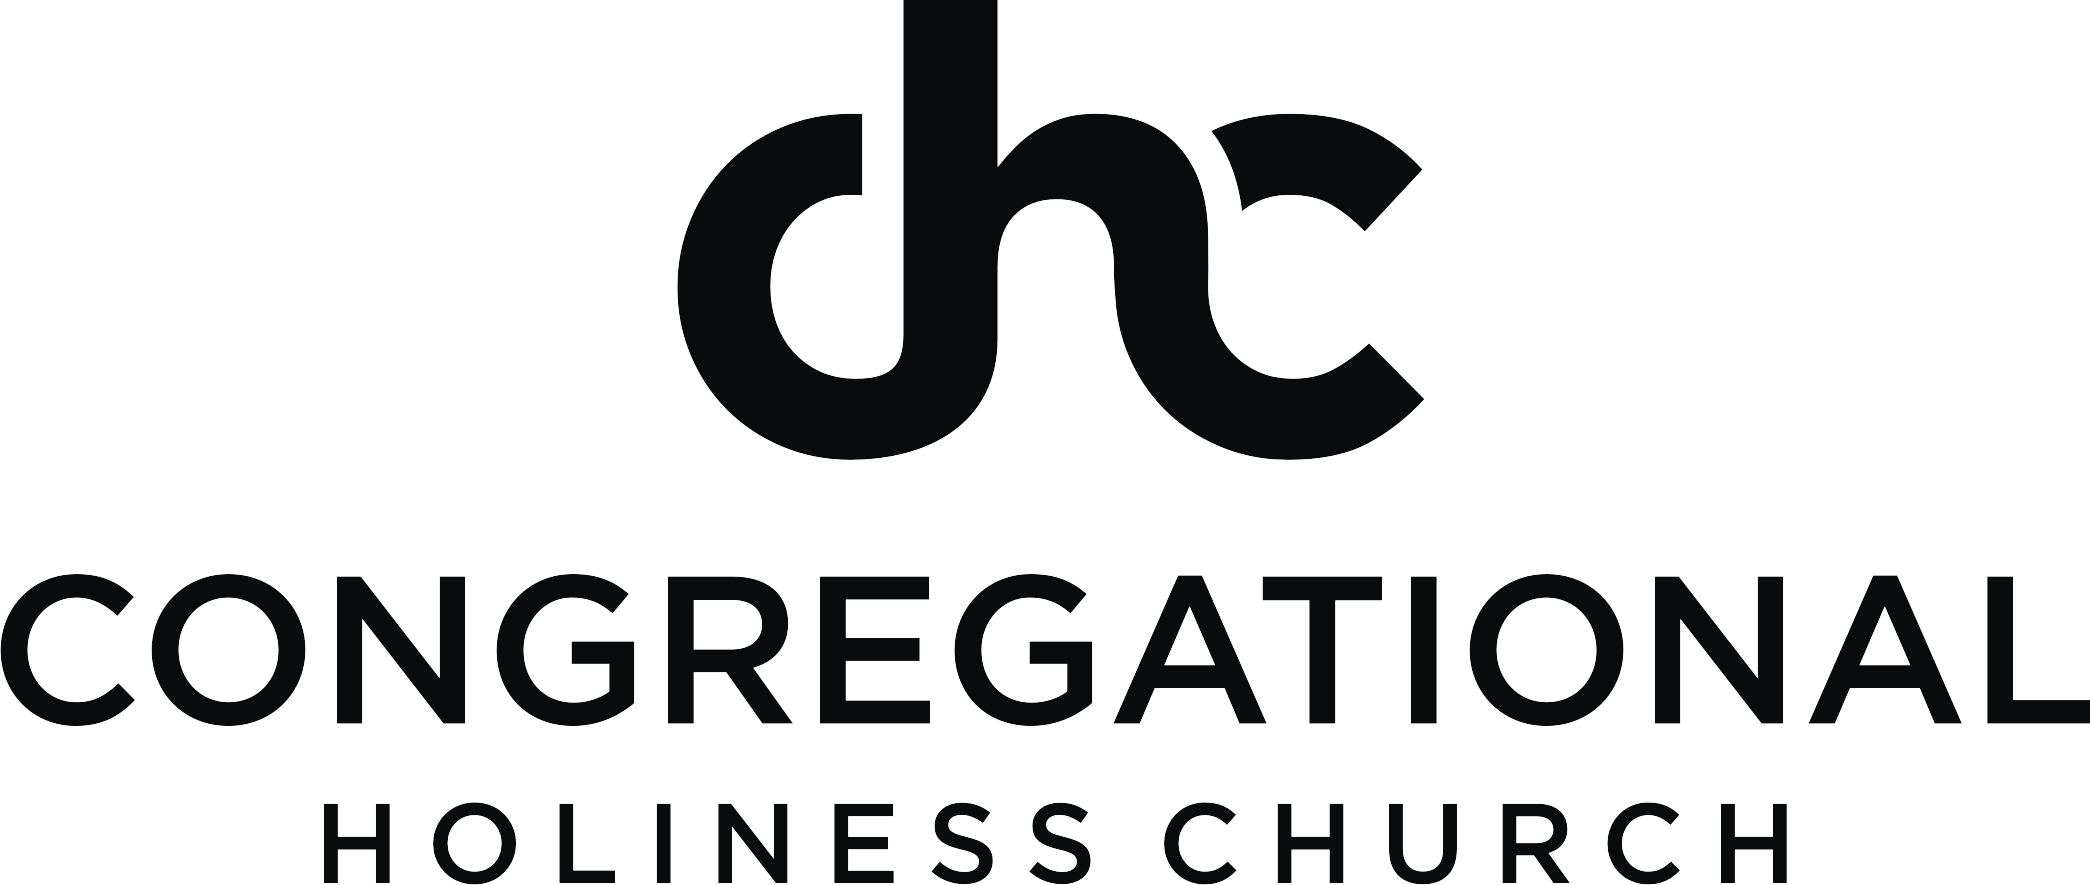 logo Congregational Holiness Church black